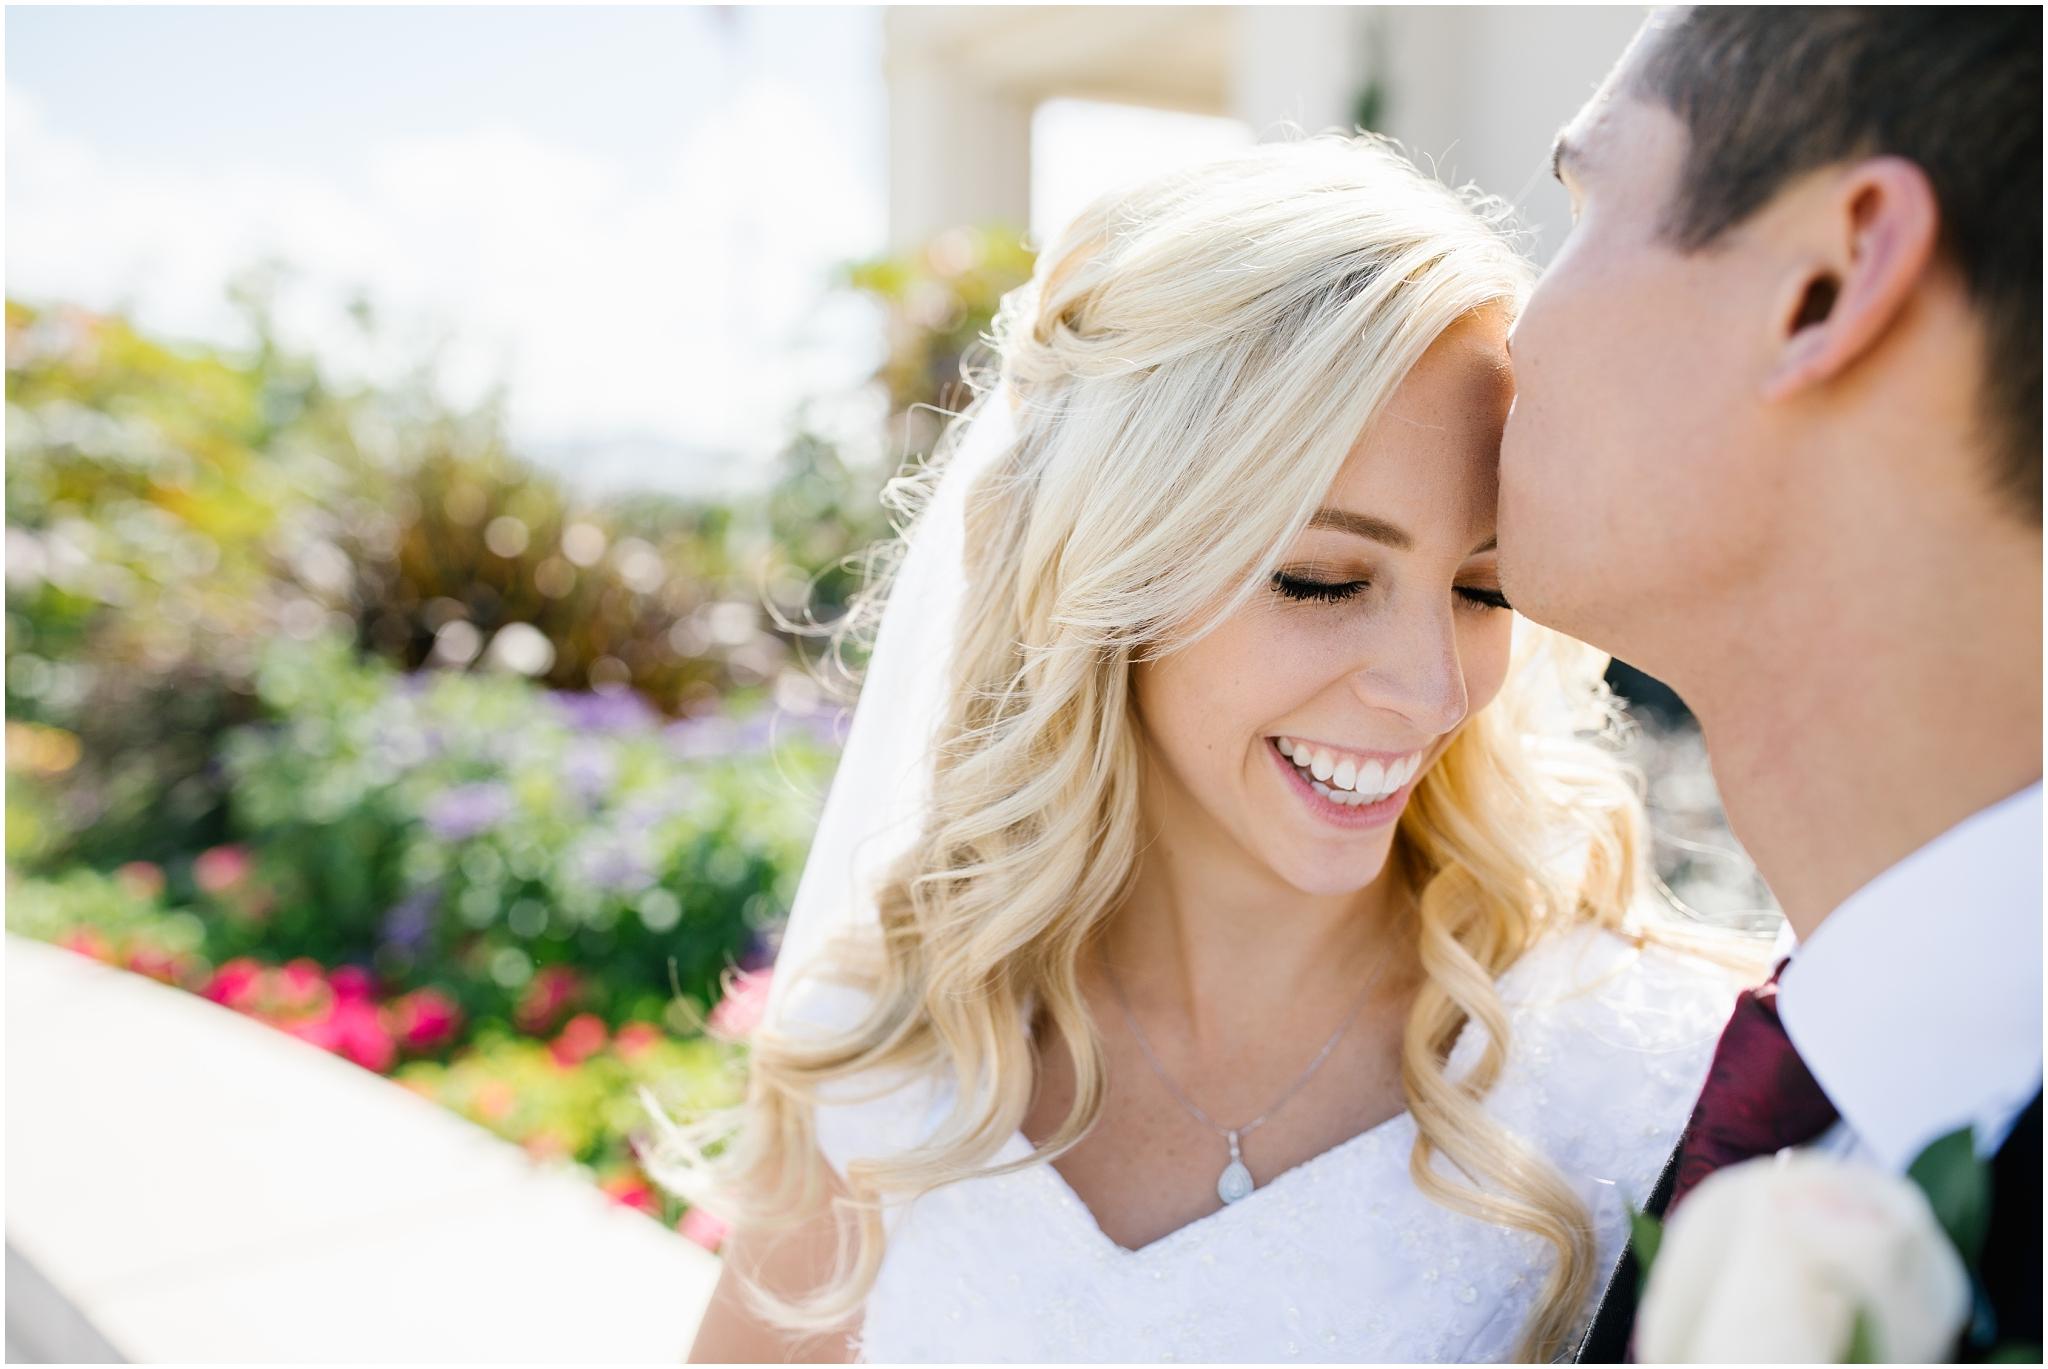 HannahChaseWedding-205_Lizzie-B-Imagery-Utah-Wedding-Photographer-Park-City-Salt-Lake-City-Payson-Temple-Clarion-Garden-Center.jpg